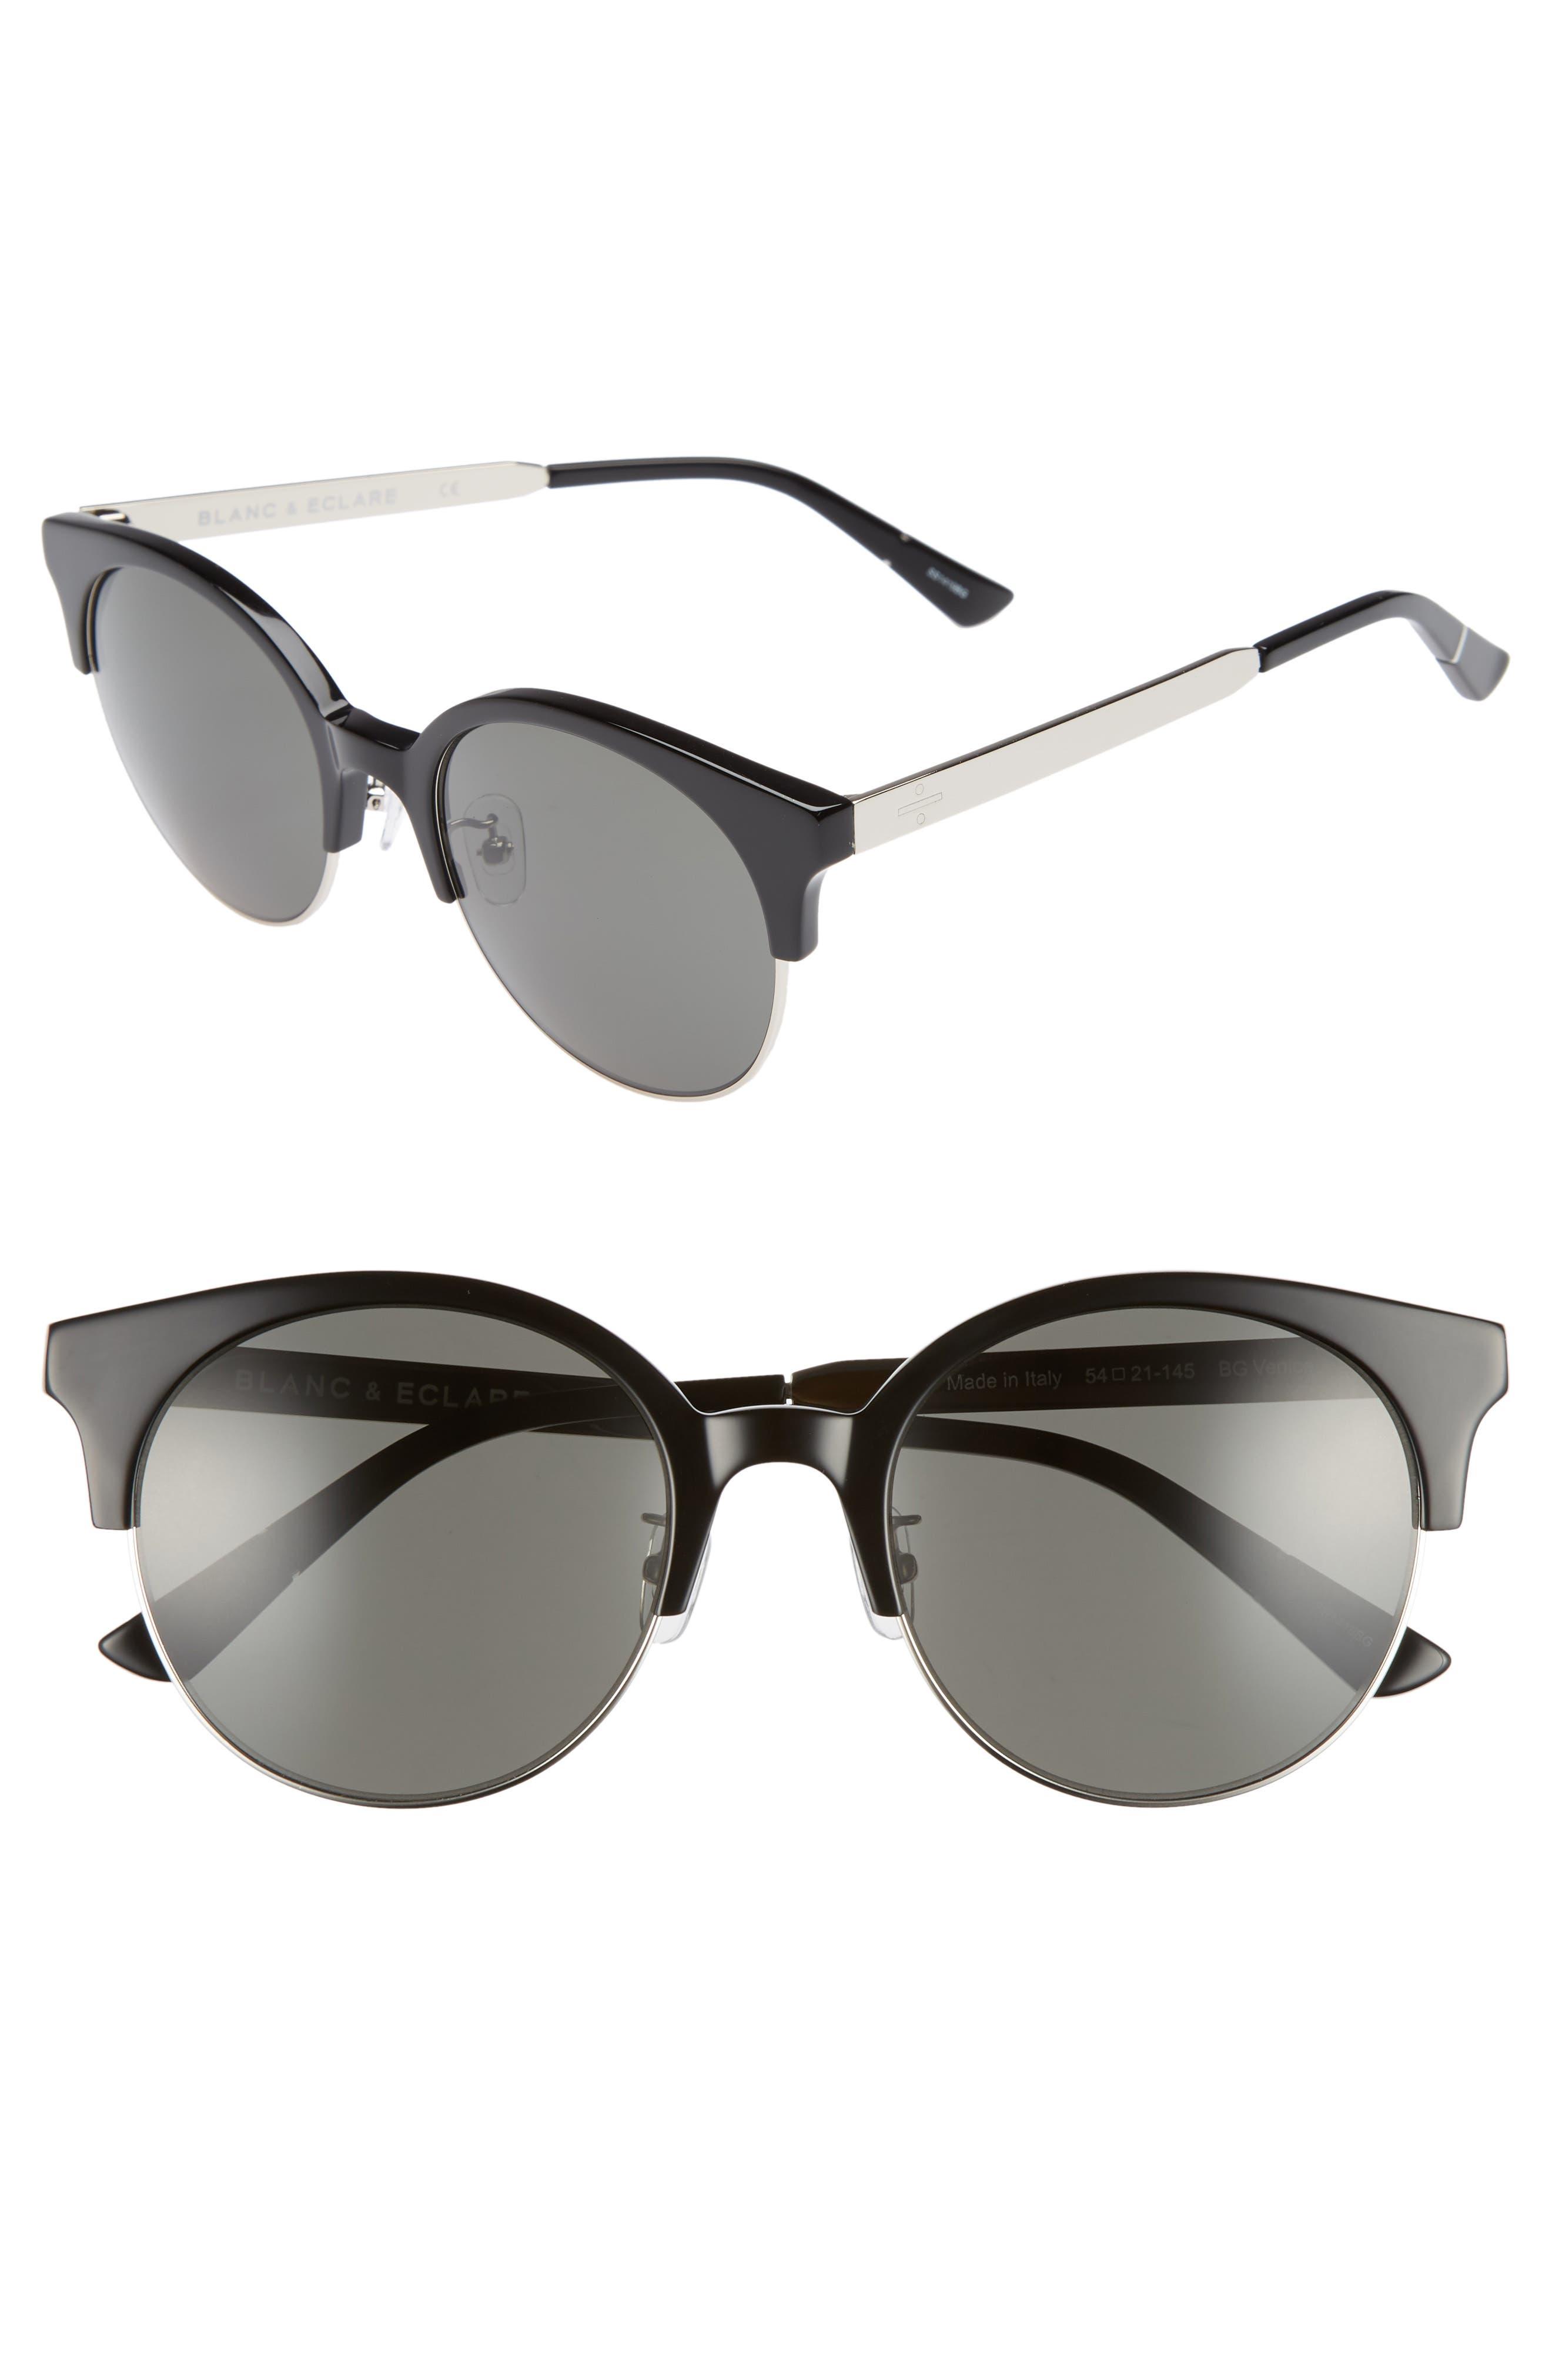 BLANC & ECLARE Venice Round Sunglasses,                             Main thumbnail 1, color,